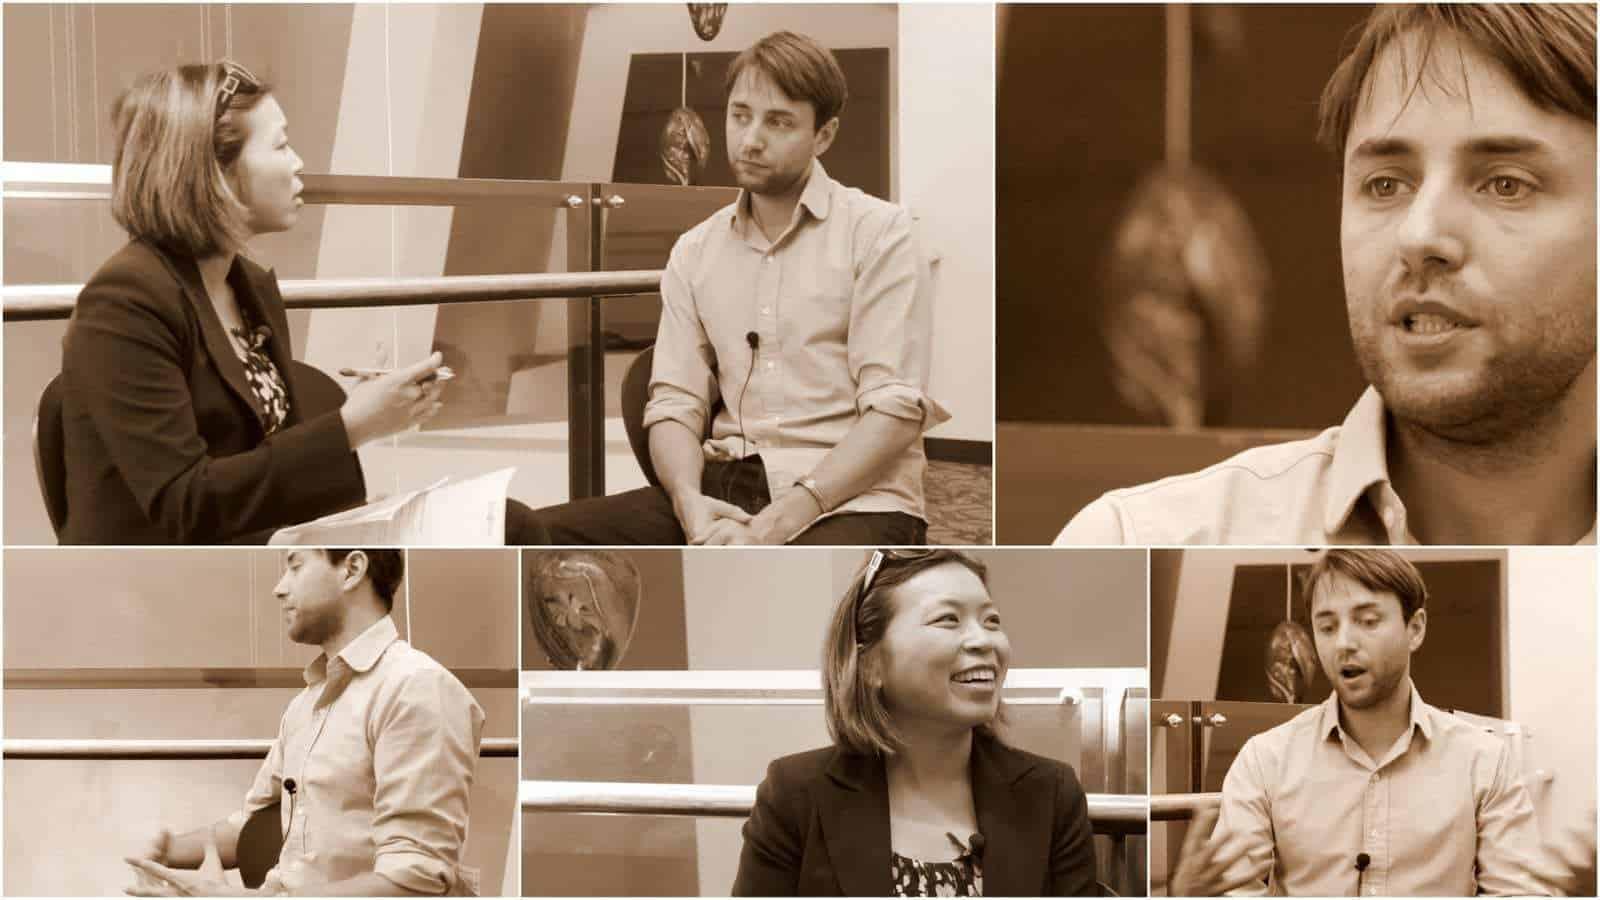 Actor Vincent Kartheiser Interview with Loni Stark